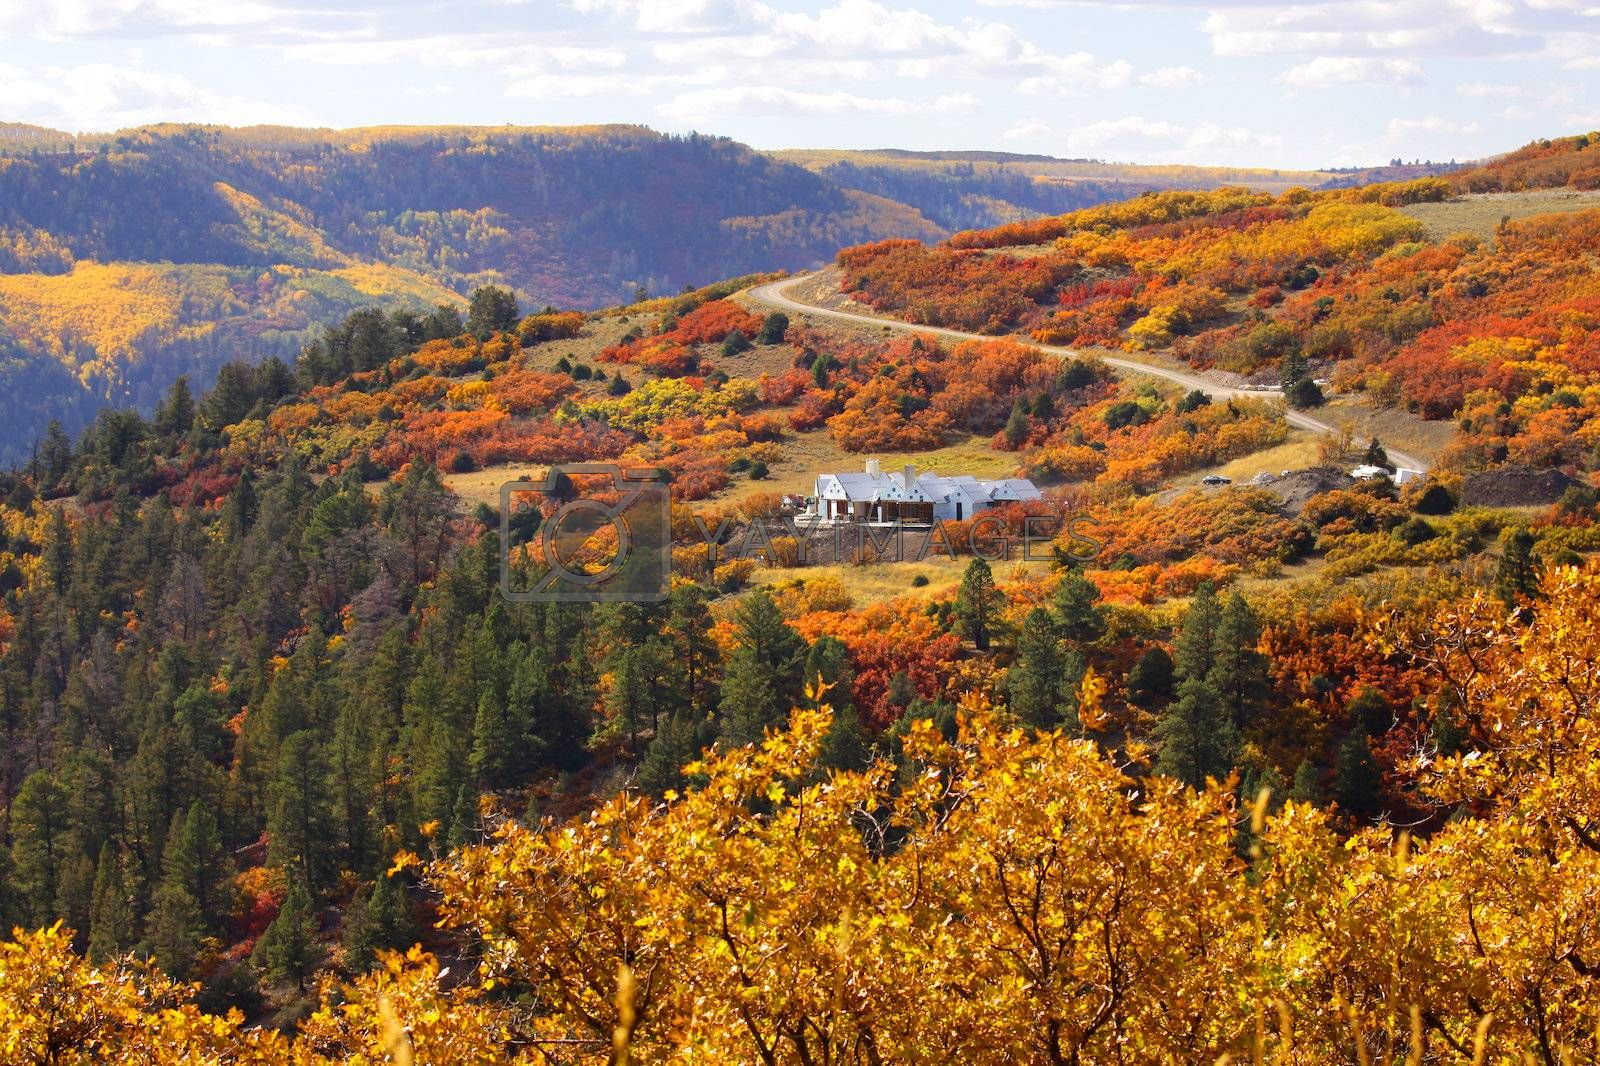 Scenic last dollar road on rocky mountain tops